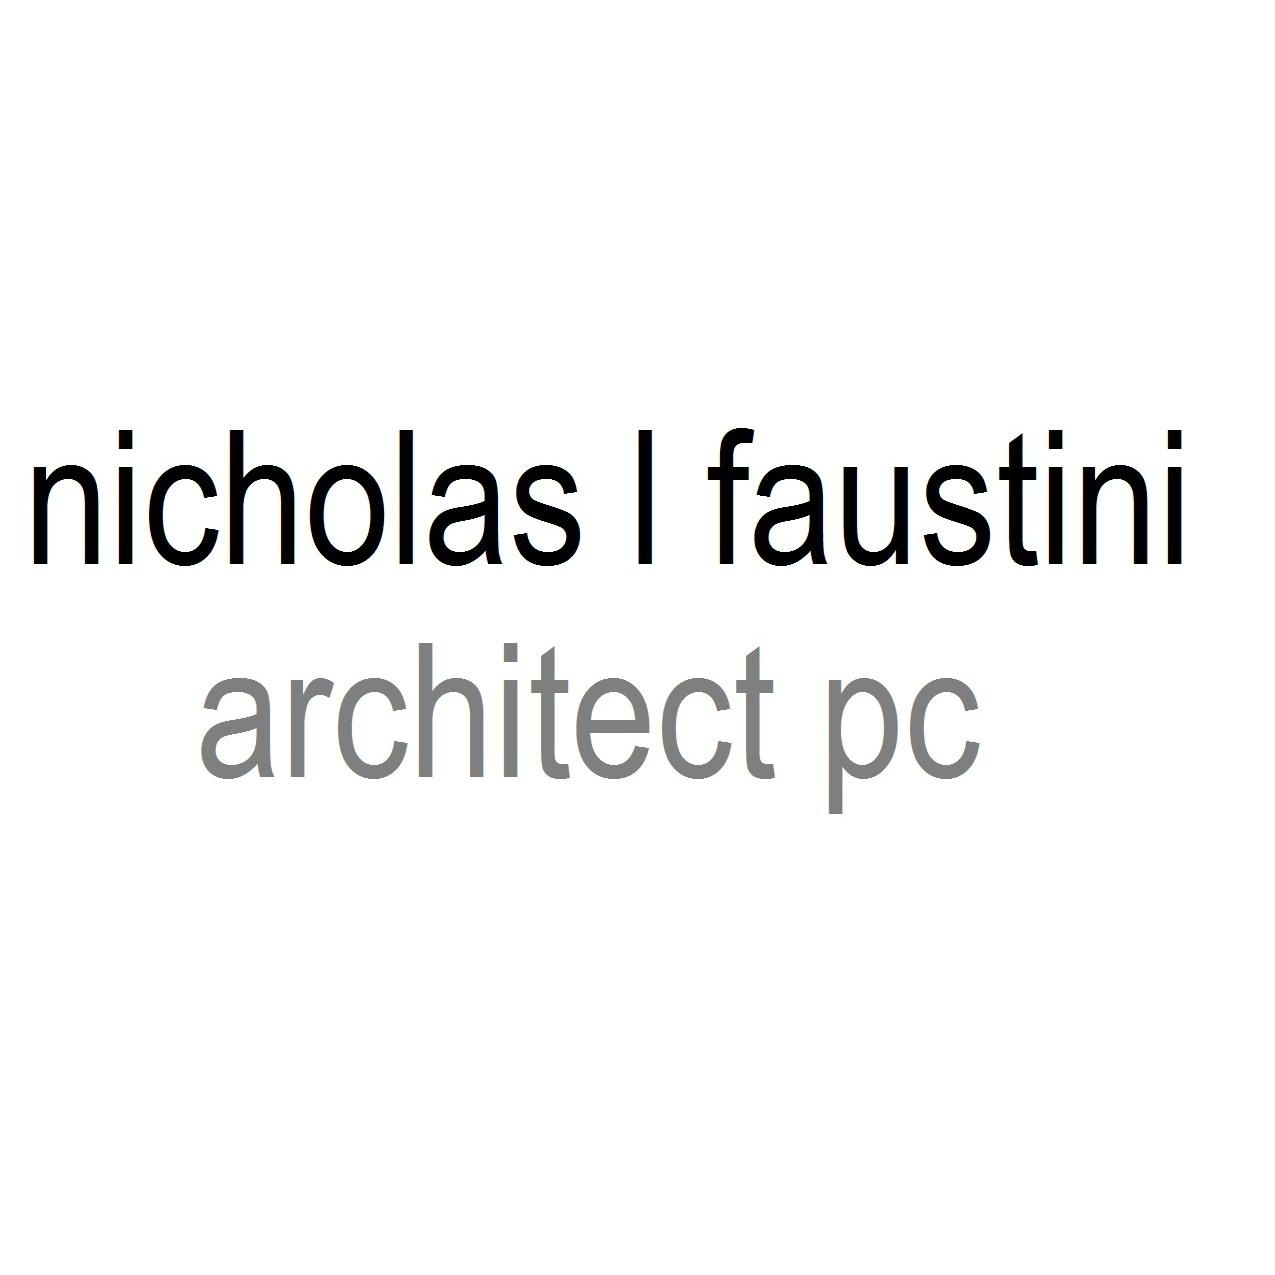 Nicholas L. Faustini Architect PC